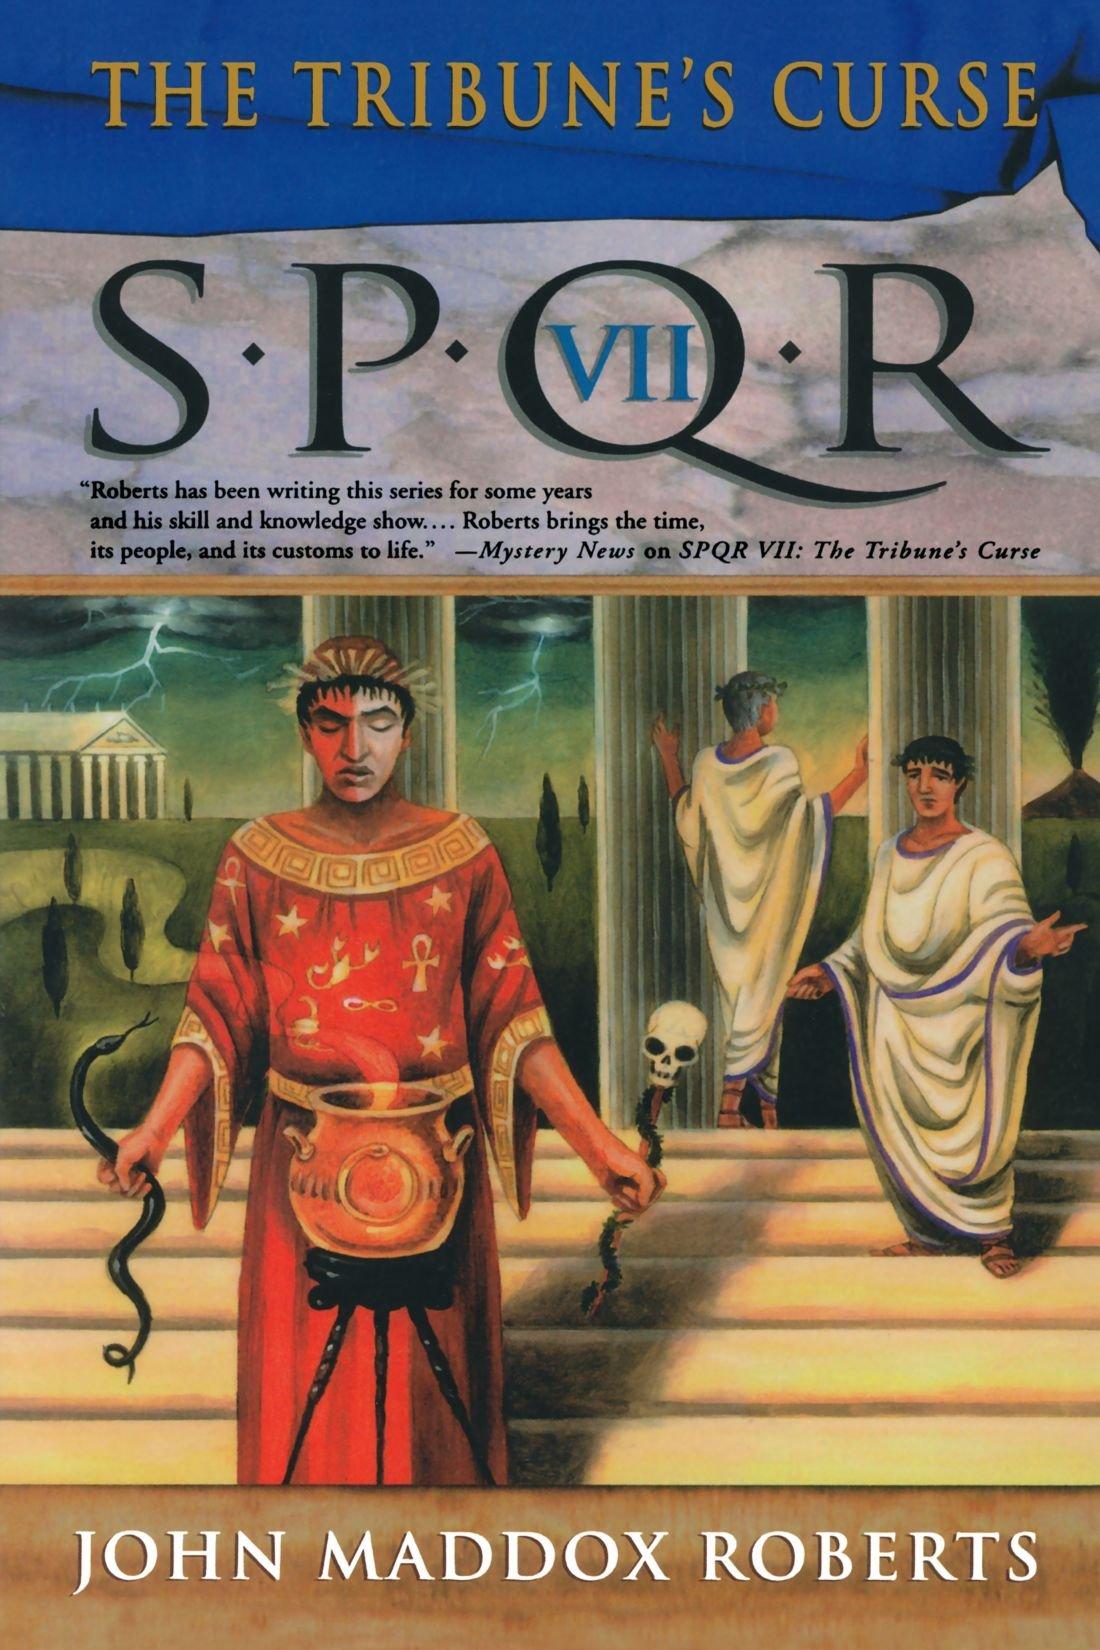 The Tribune's Curse (SPQR VII) PDF